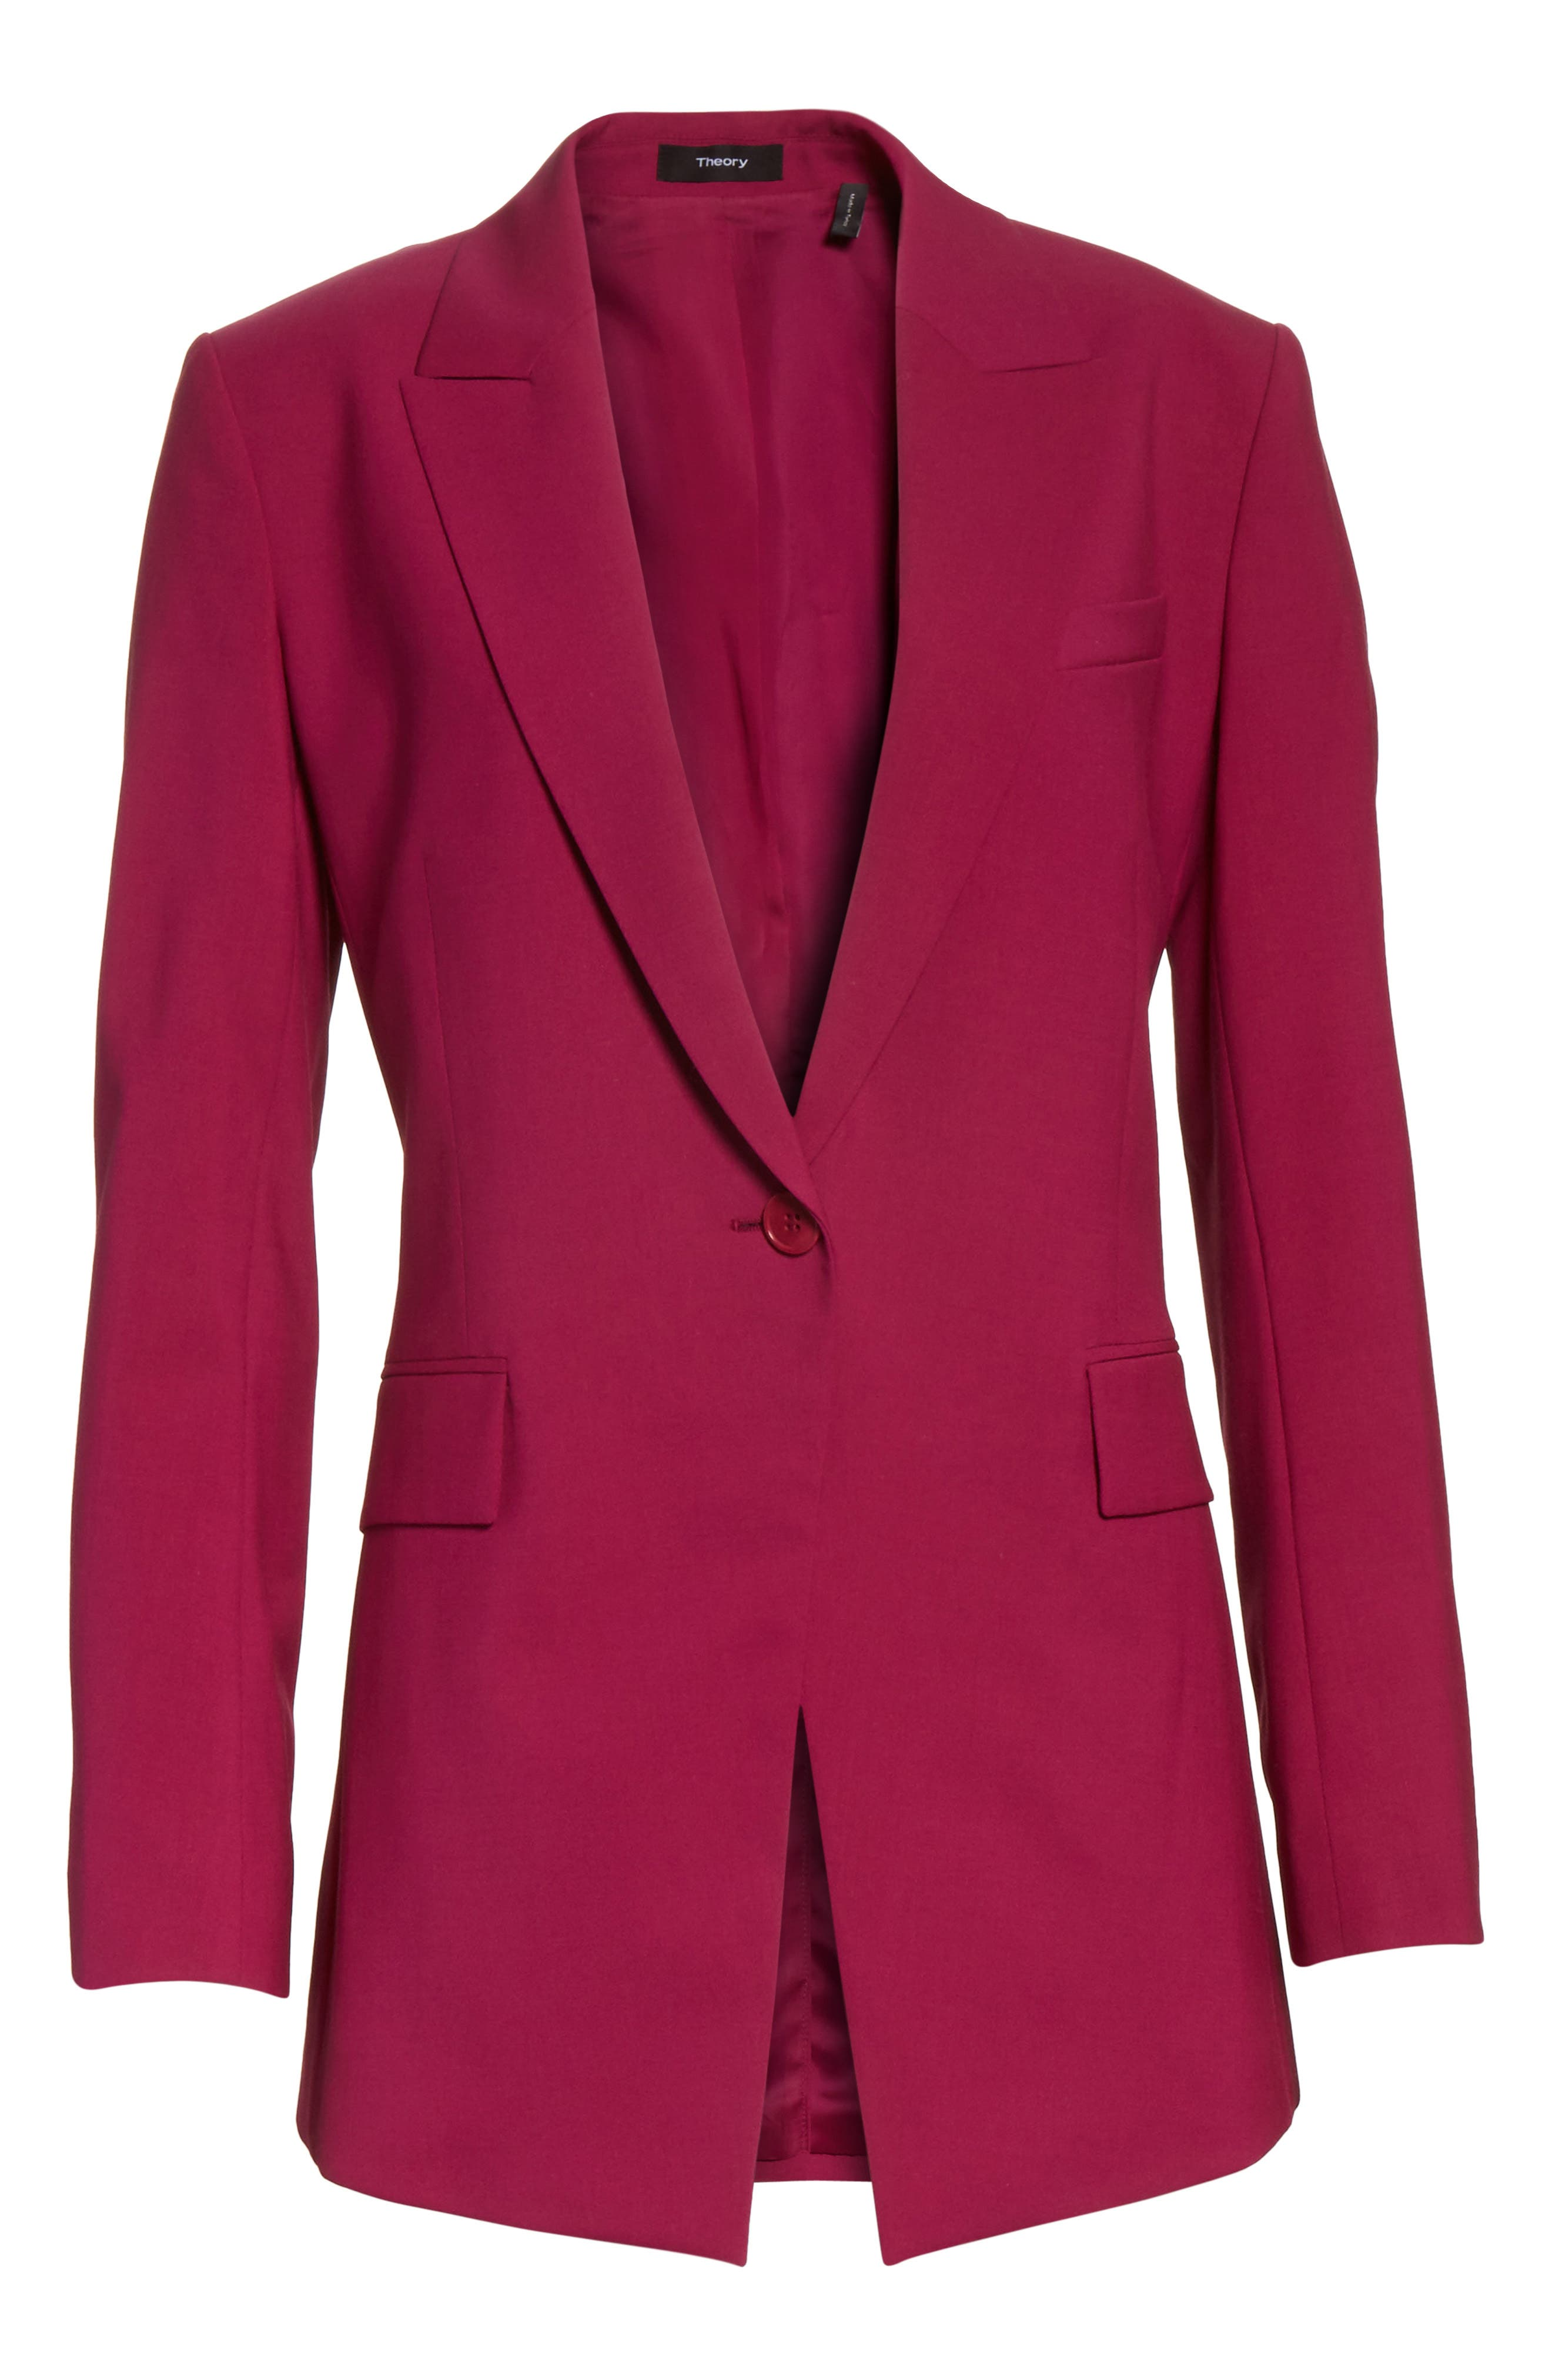 Etienette B Good Wool Suit Jacket,                             Alternate thumbnail 38, color,